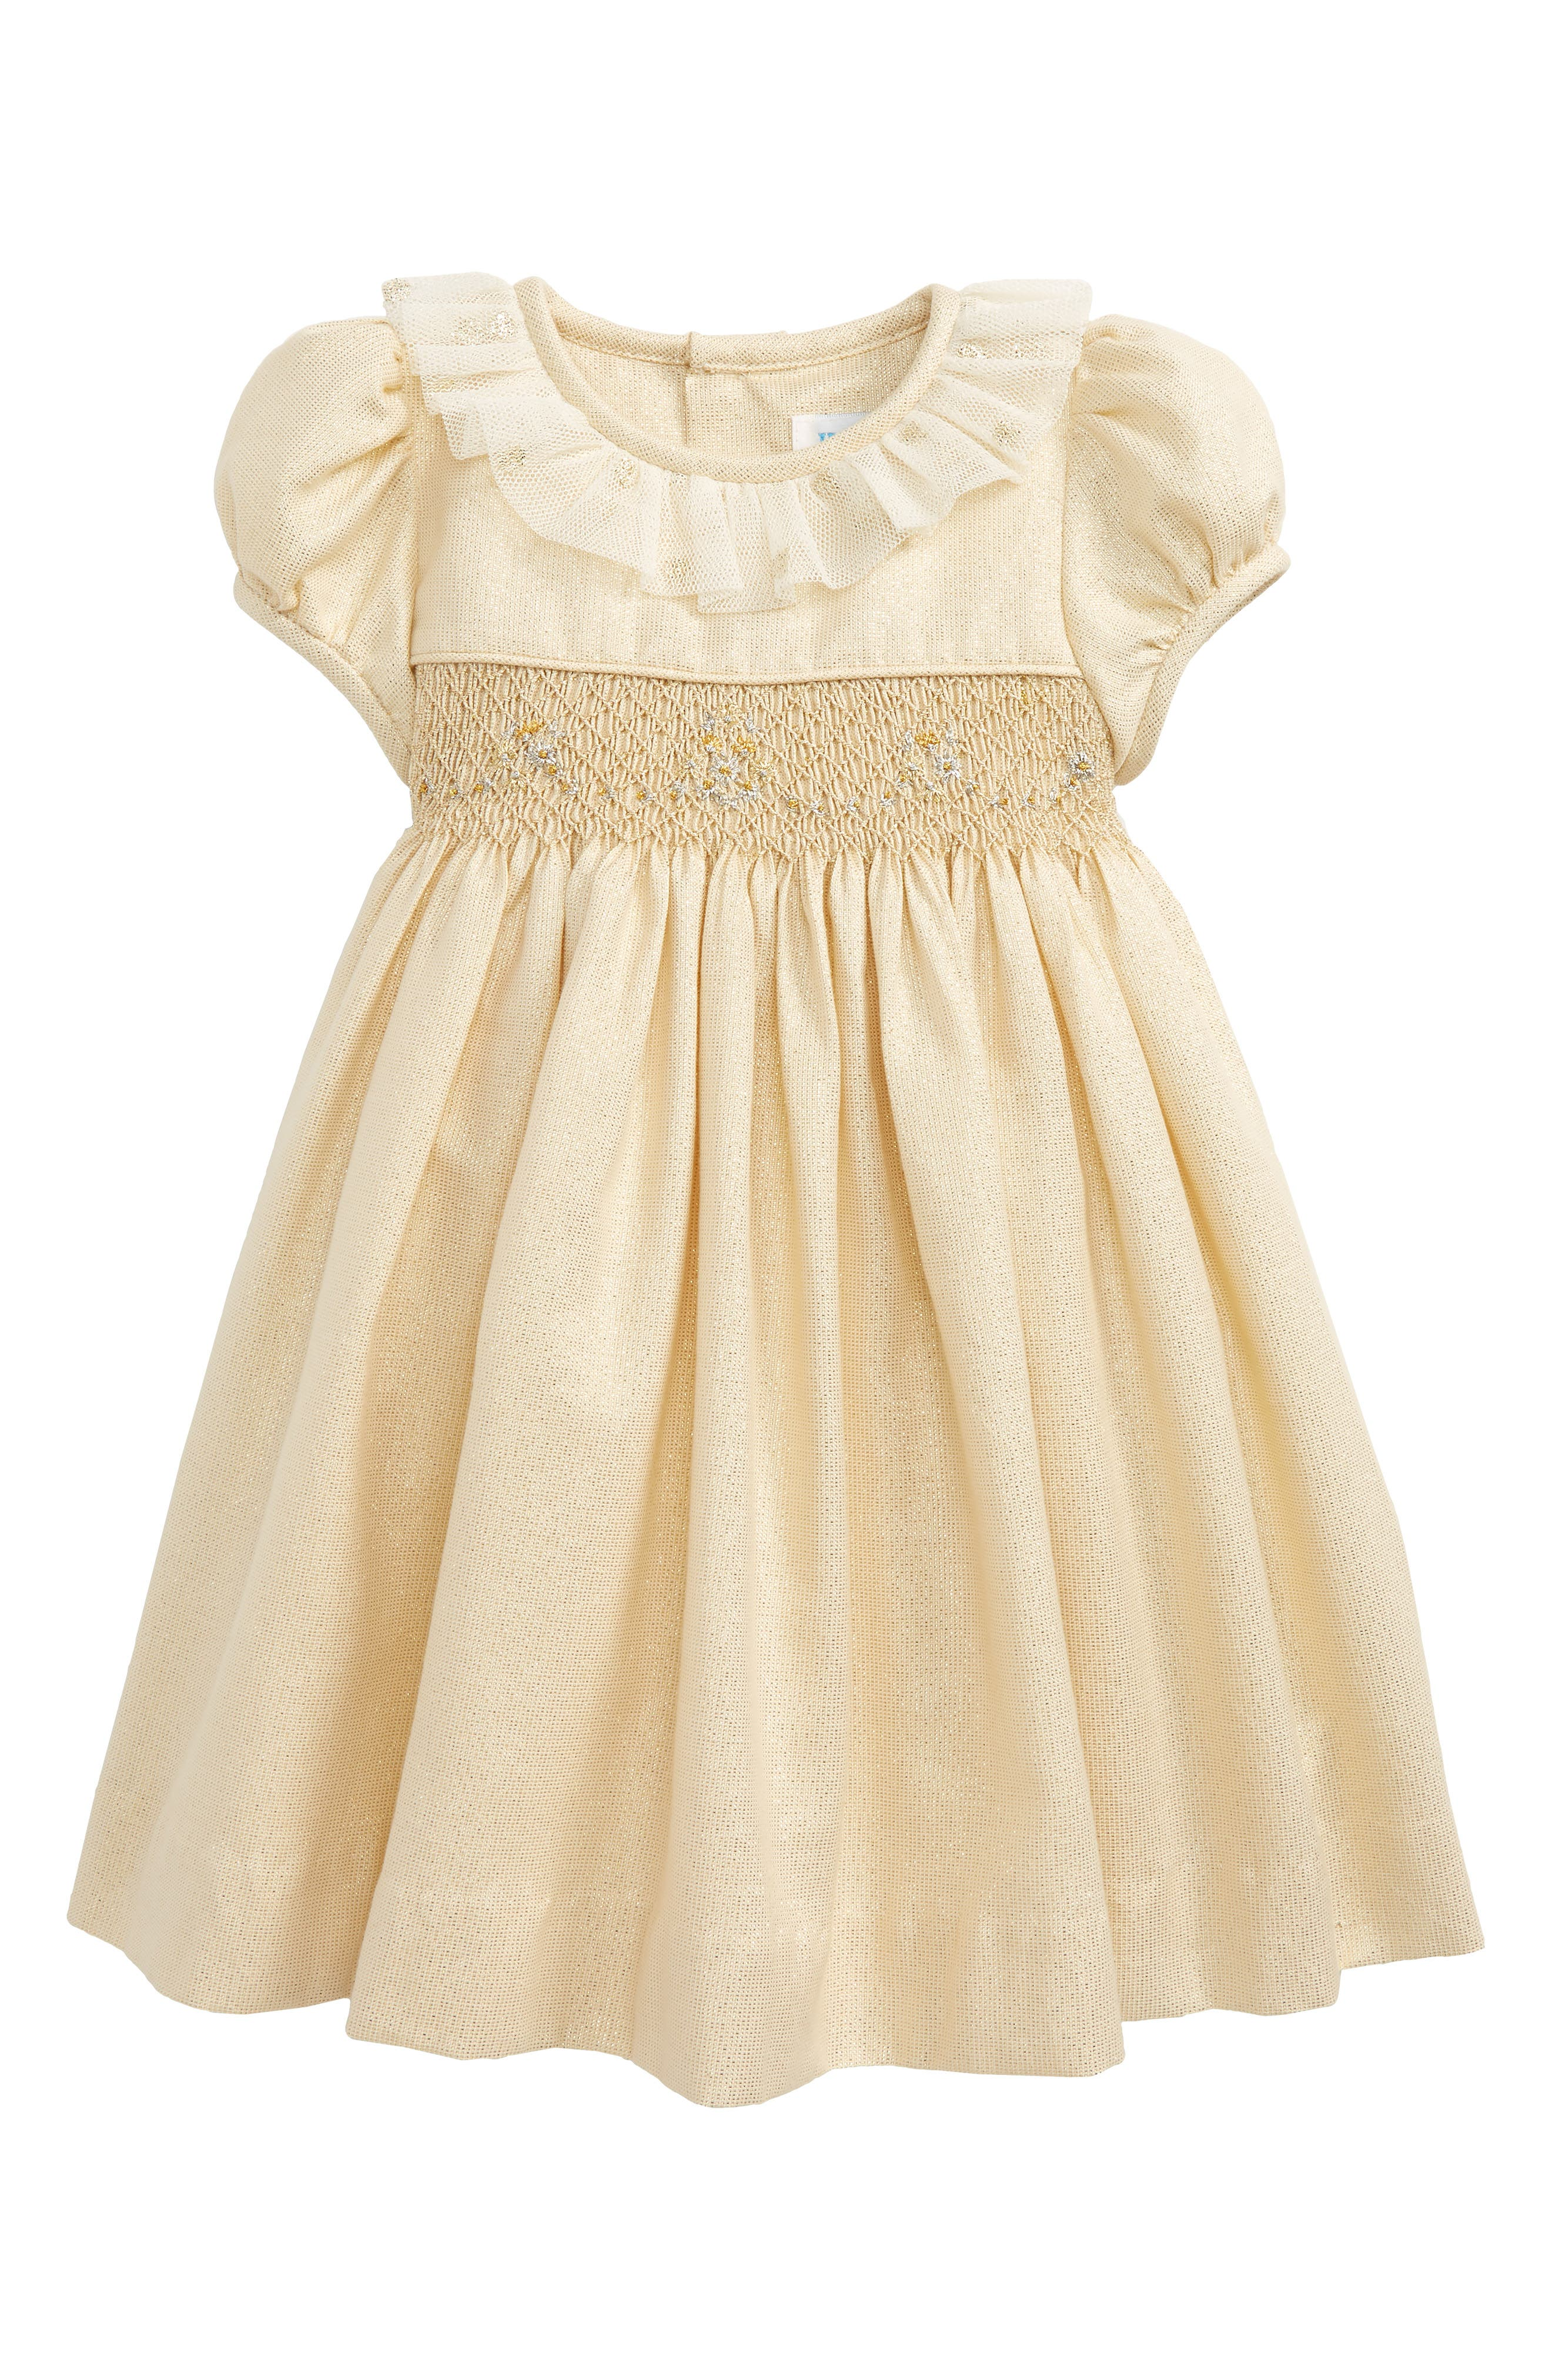 Jacquard Smocked Dress,                             Main thumbnail 1, color,                             700